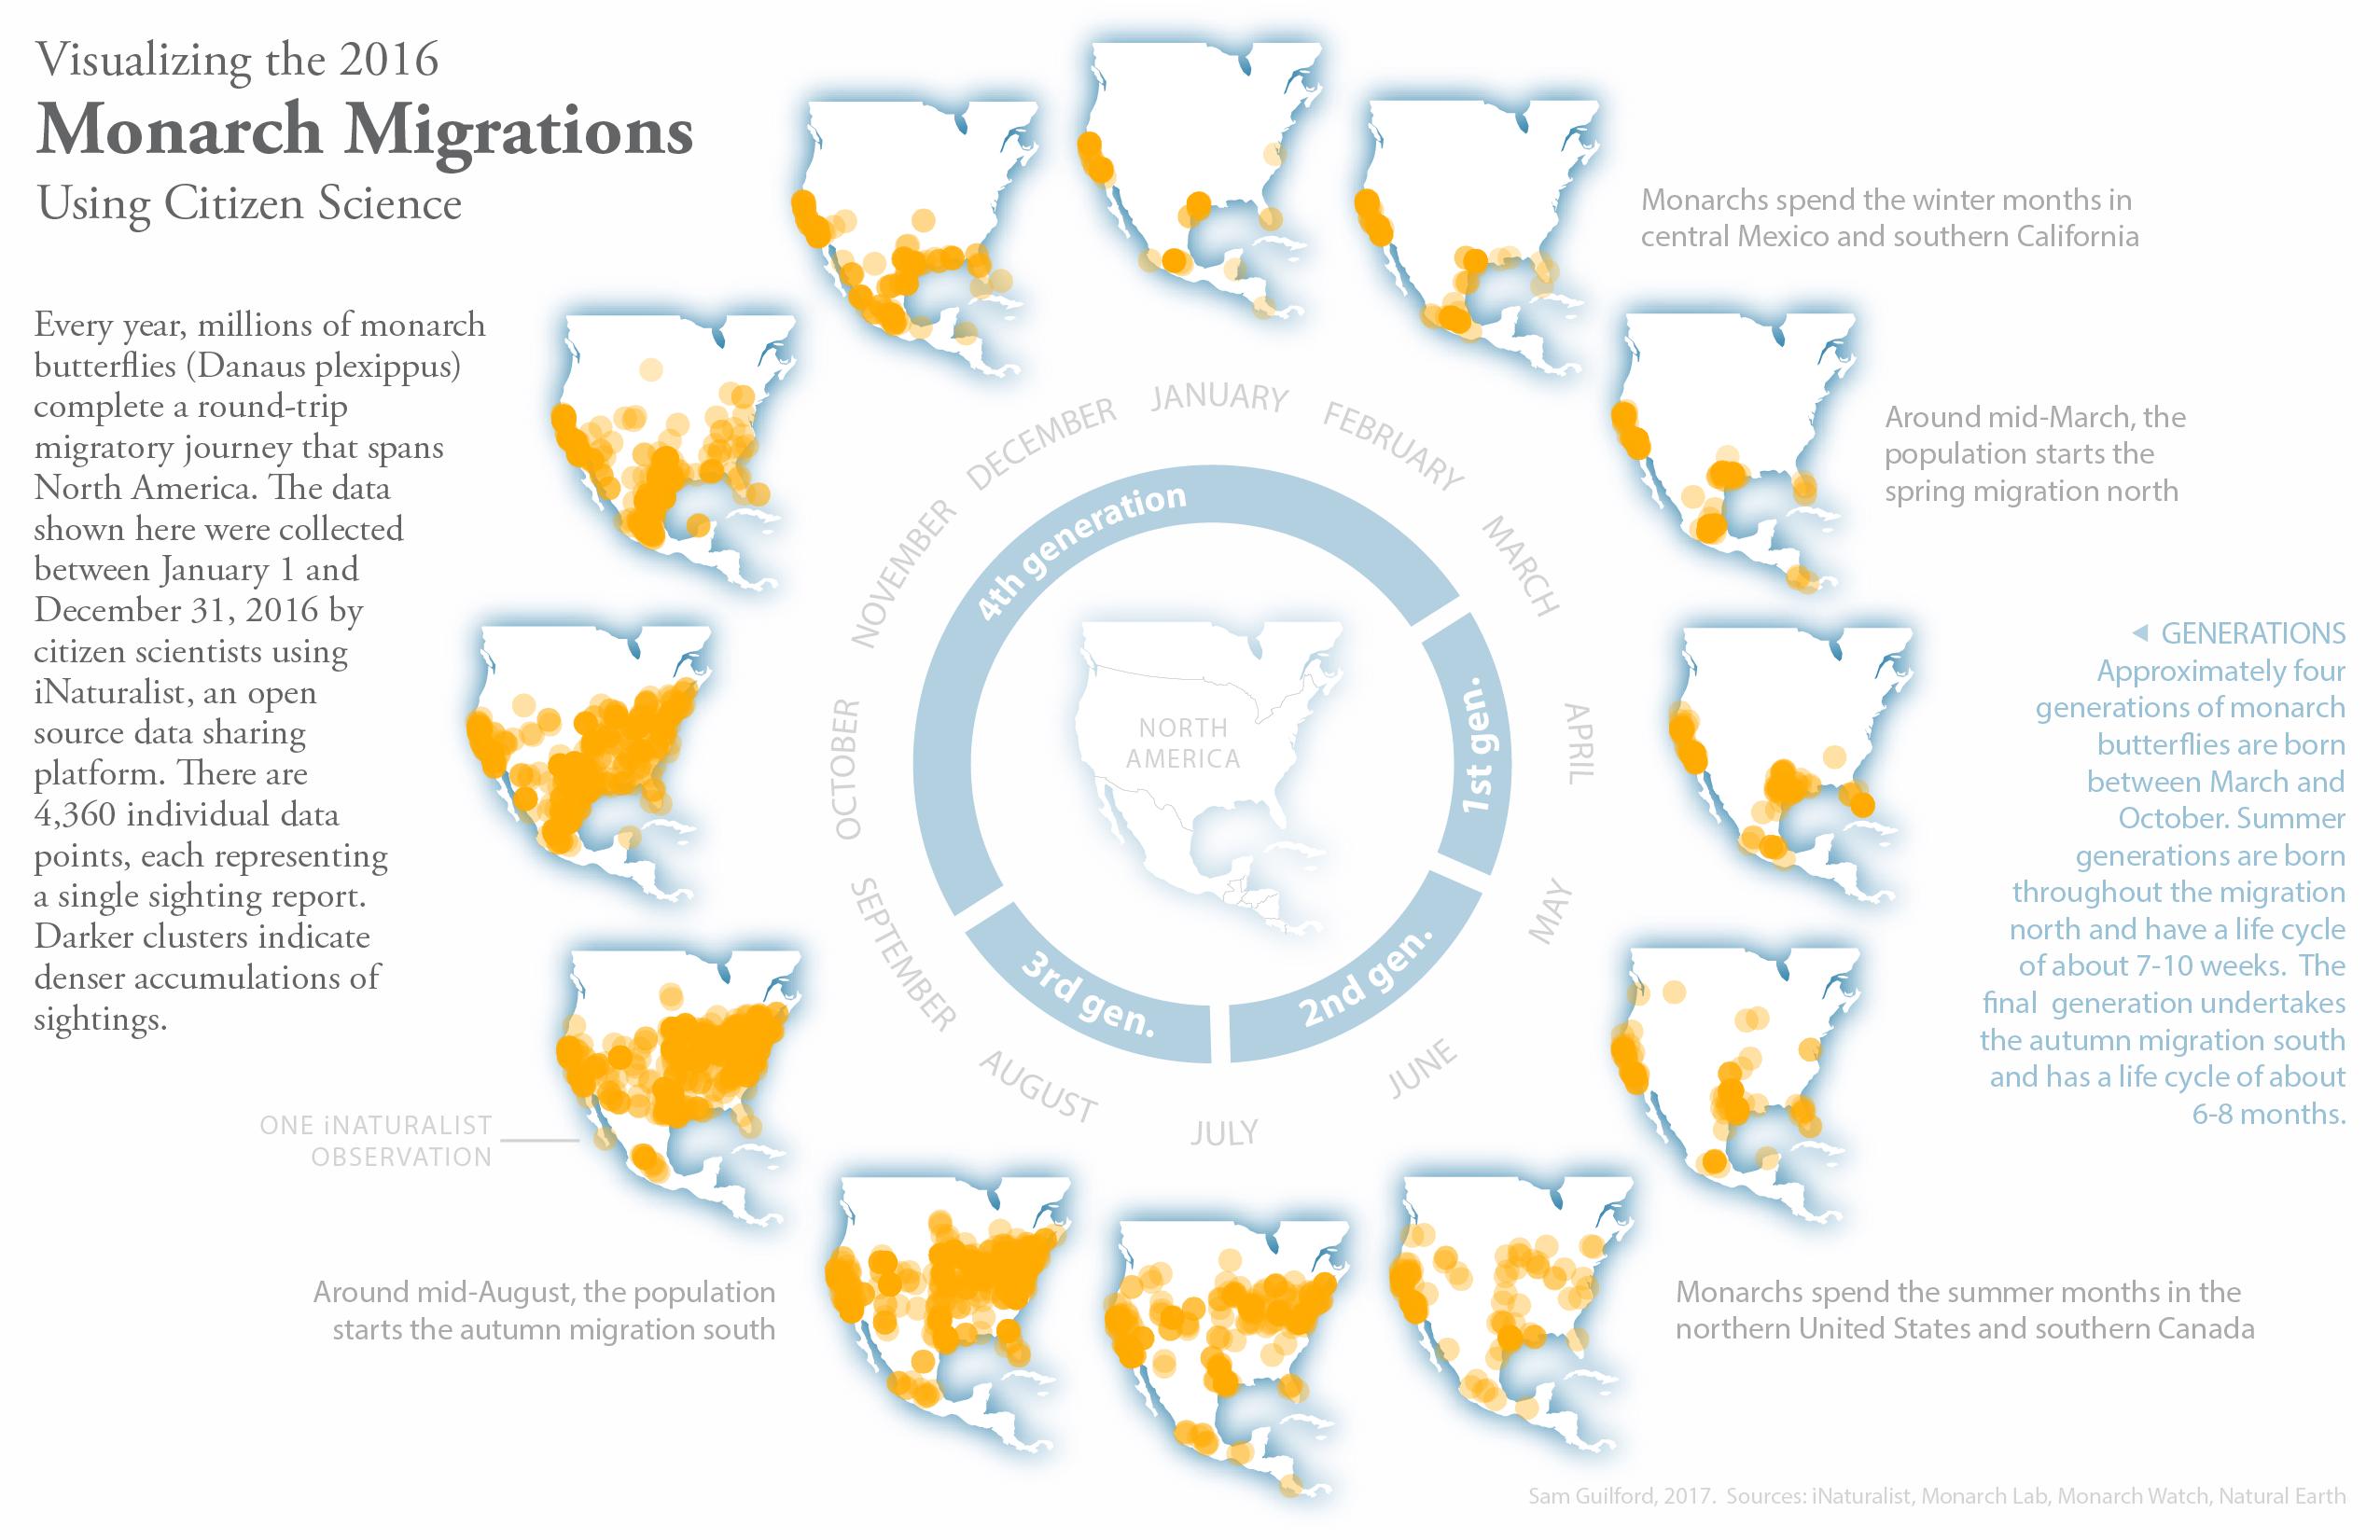 Monarch migrations, using iNaturalist data